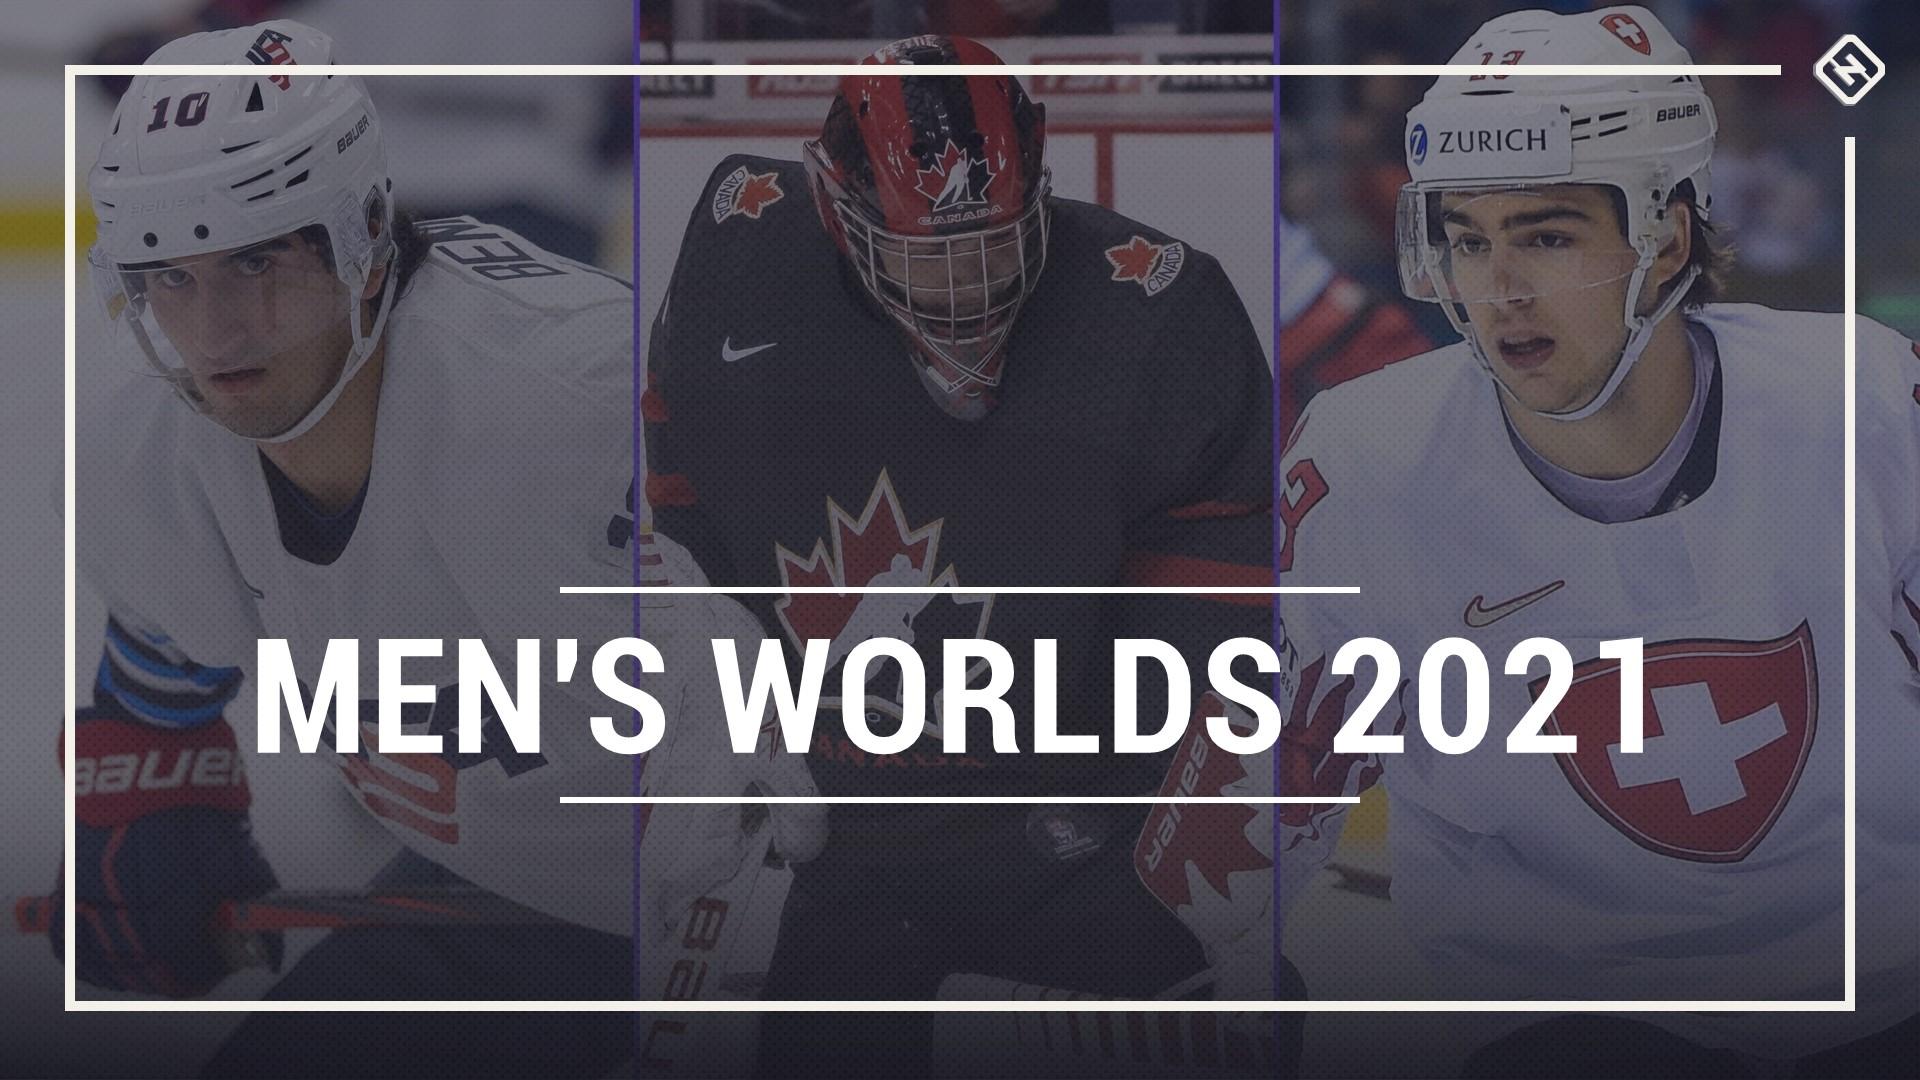 IIHF Men's World Championship 2021: Time, TV channel, live stream, where, when, schedule